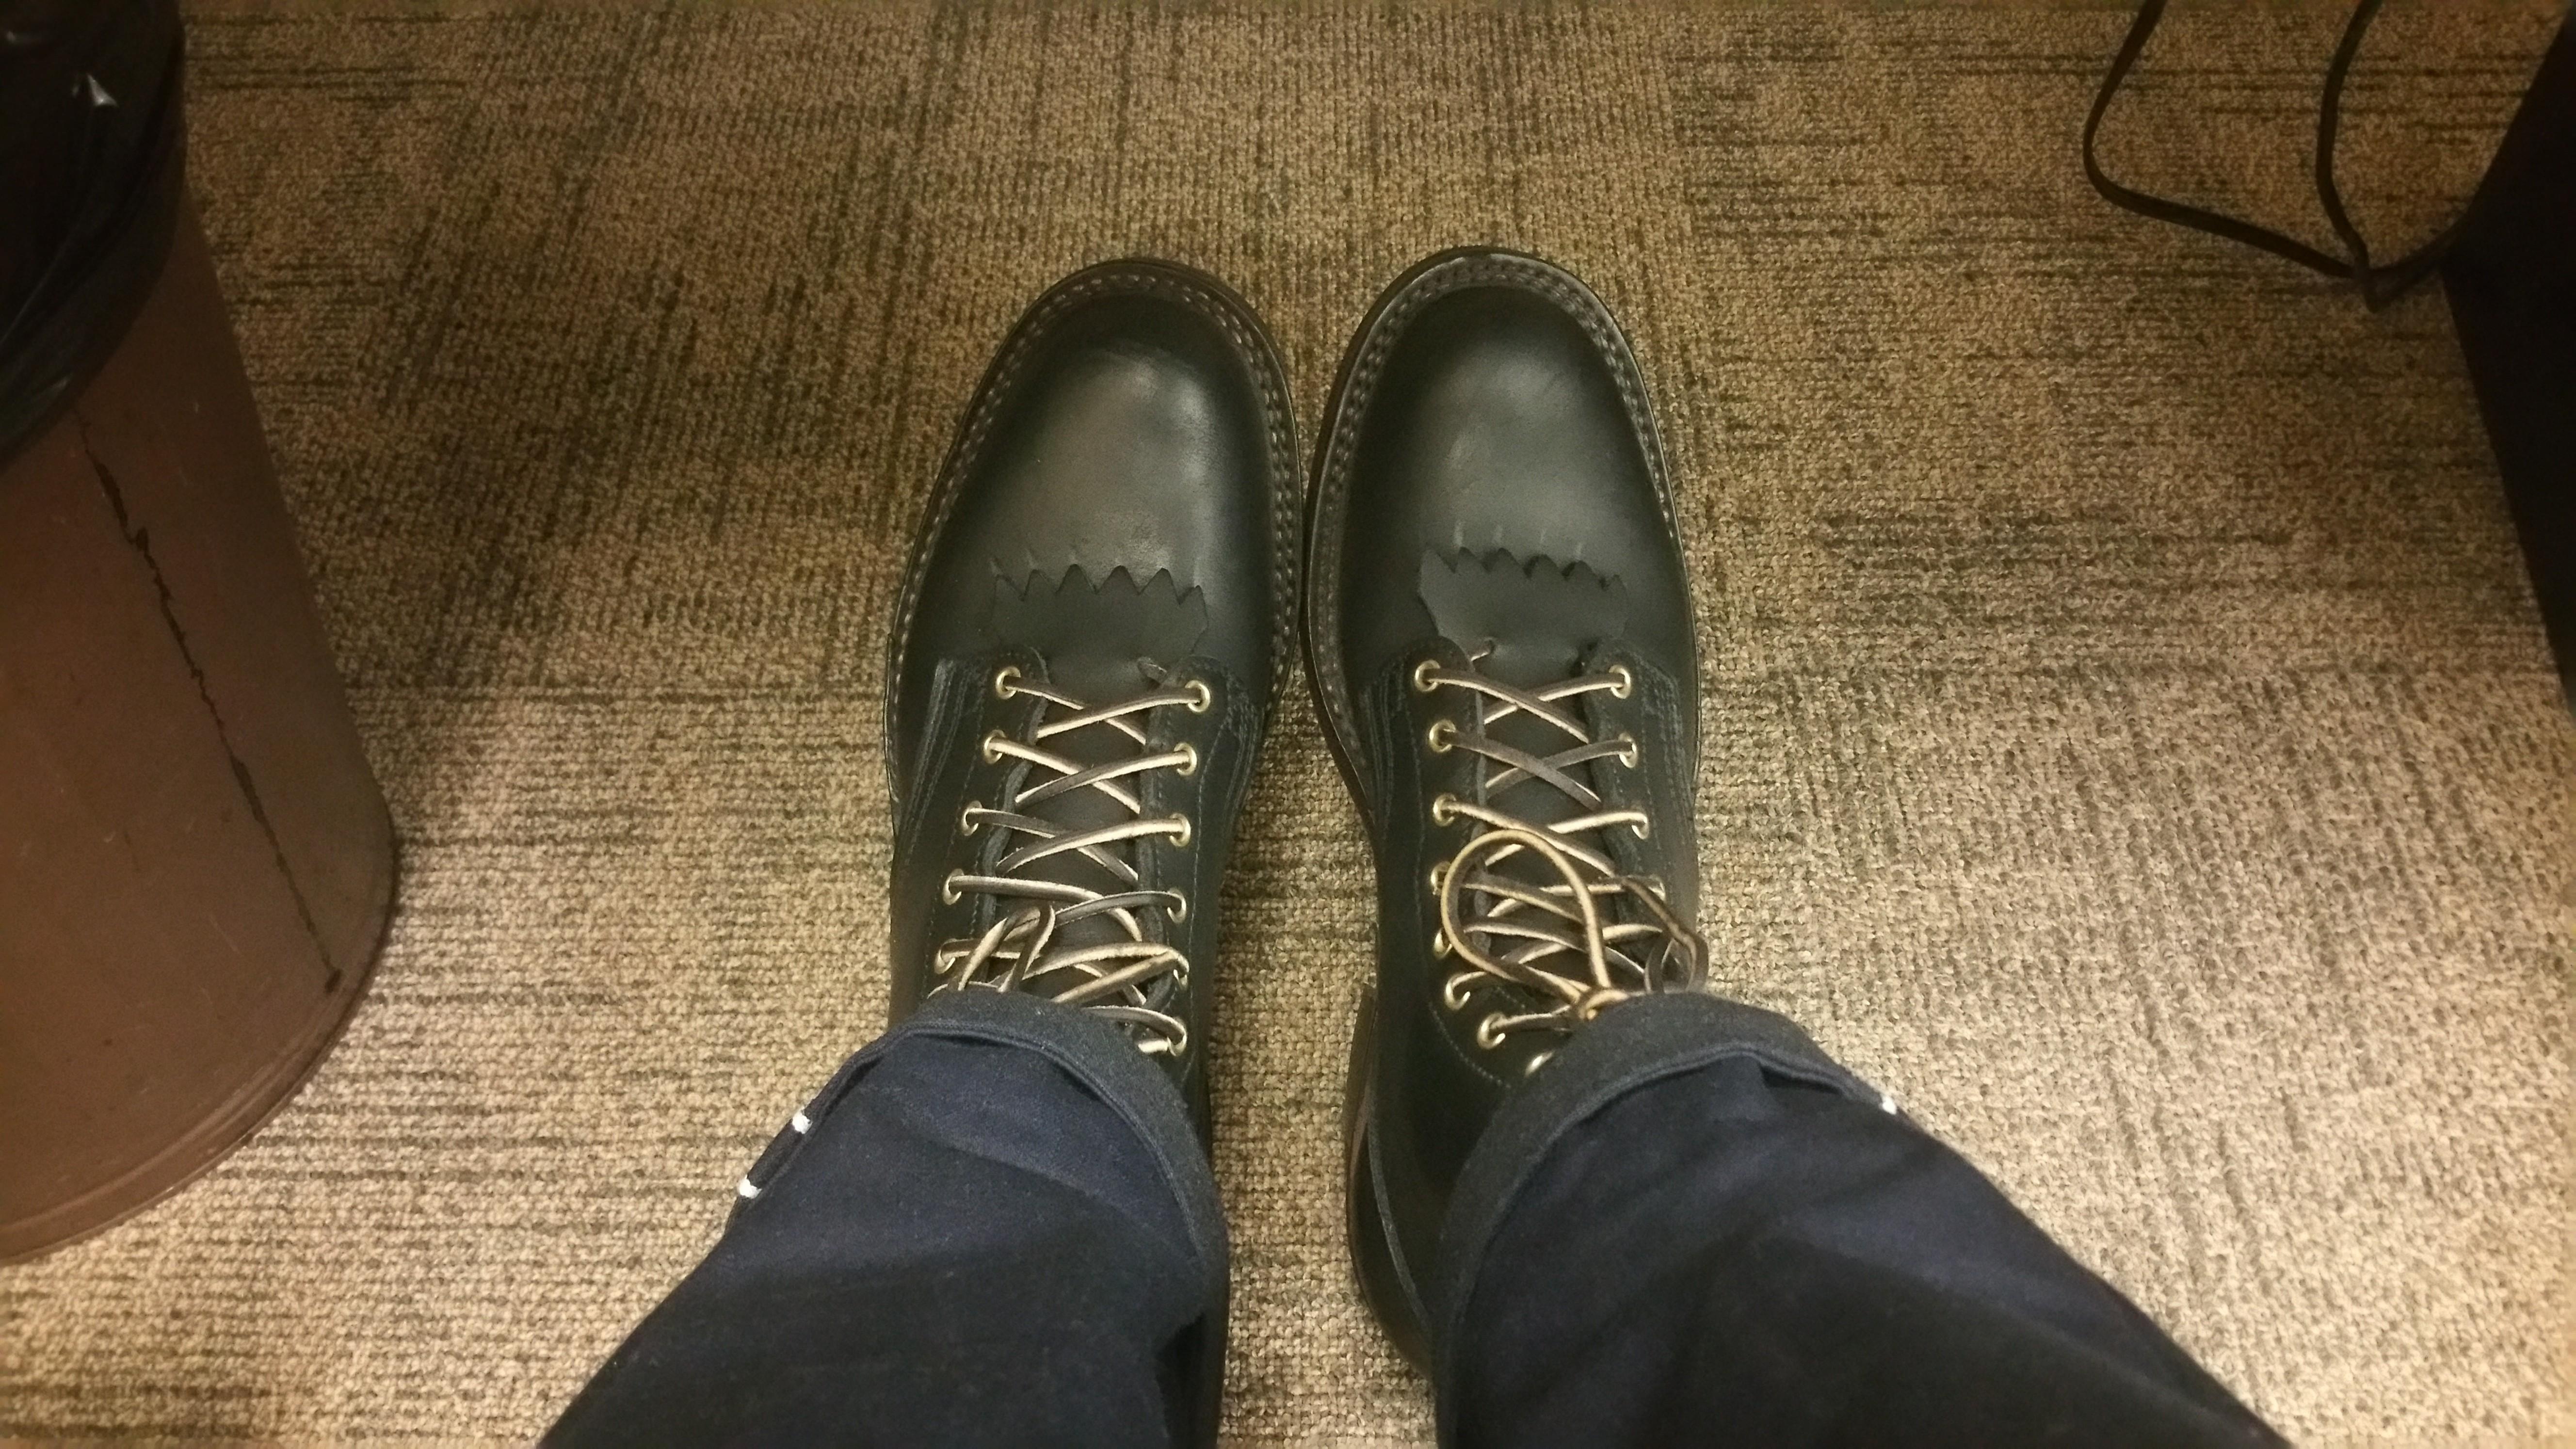 ryan chinaski's photos in Nick's Boots